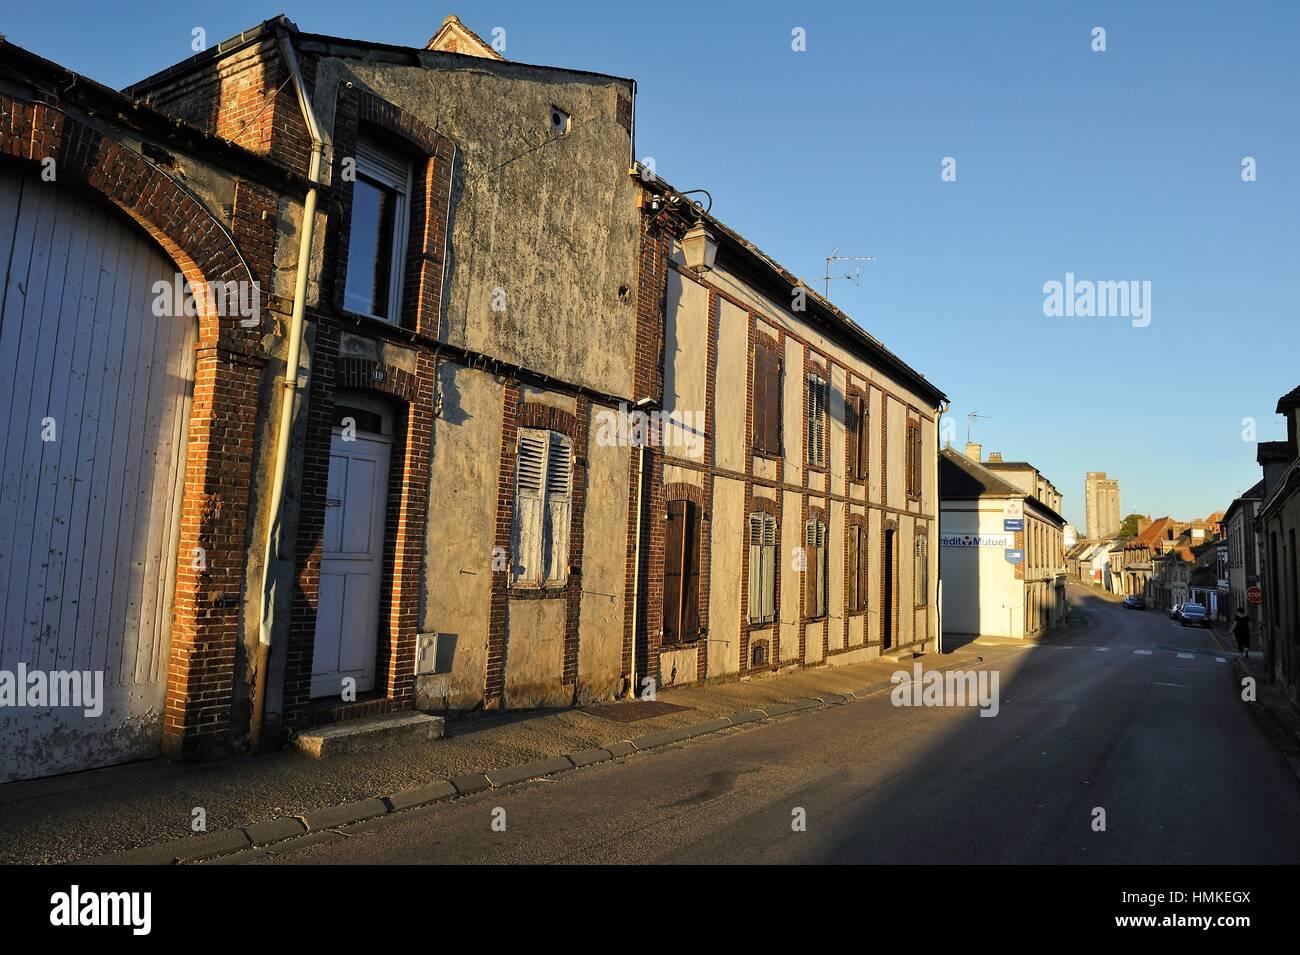 decrepit facades in the village of Brezolles, Natural region of Thymerais, department of Eure-et-Loir, Centre-Val - Stock Image